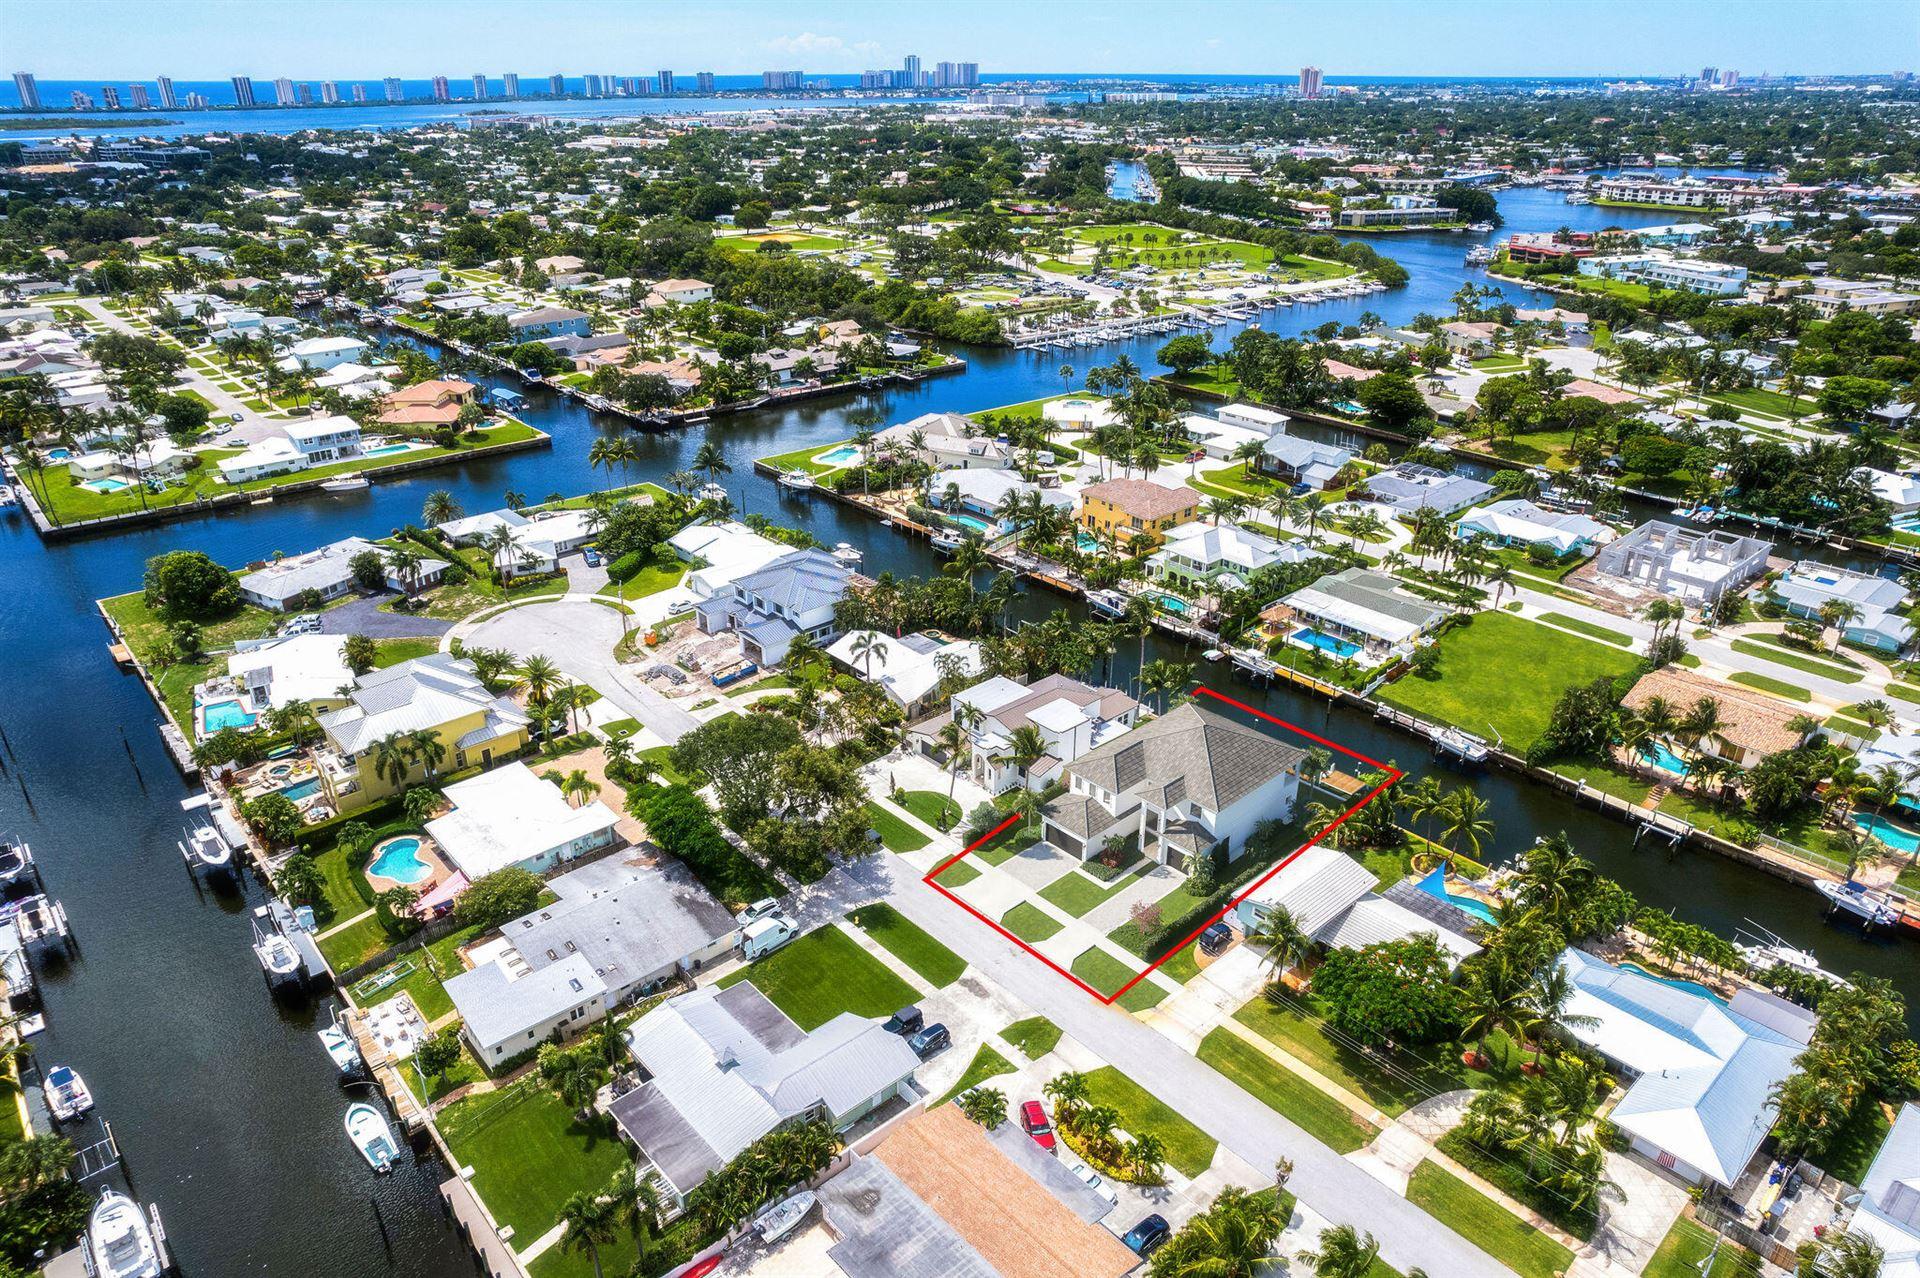 Photo of 720 Kittyhawk Way, North Palm Beach, FL 33408 (MLS # RX-10731338)